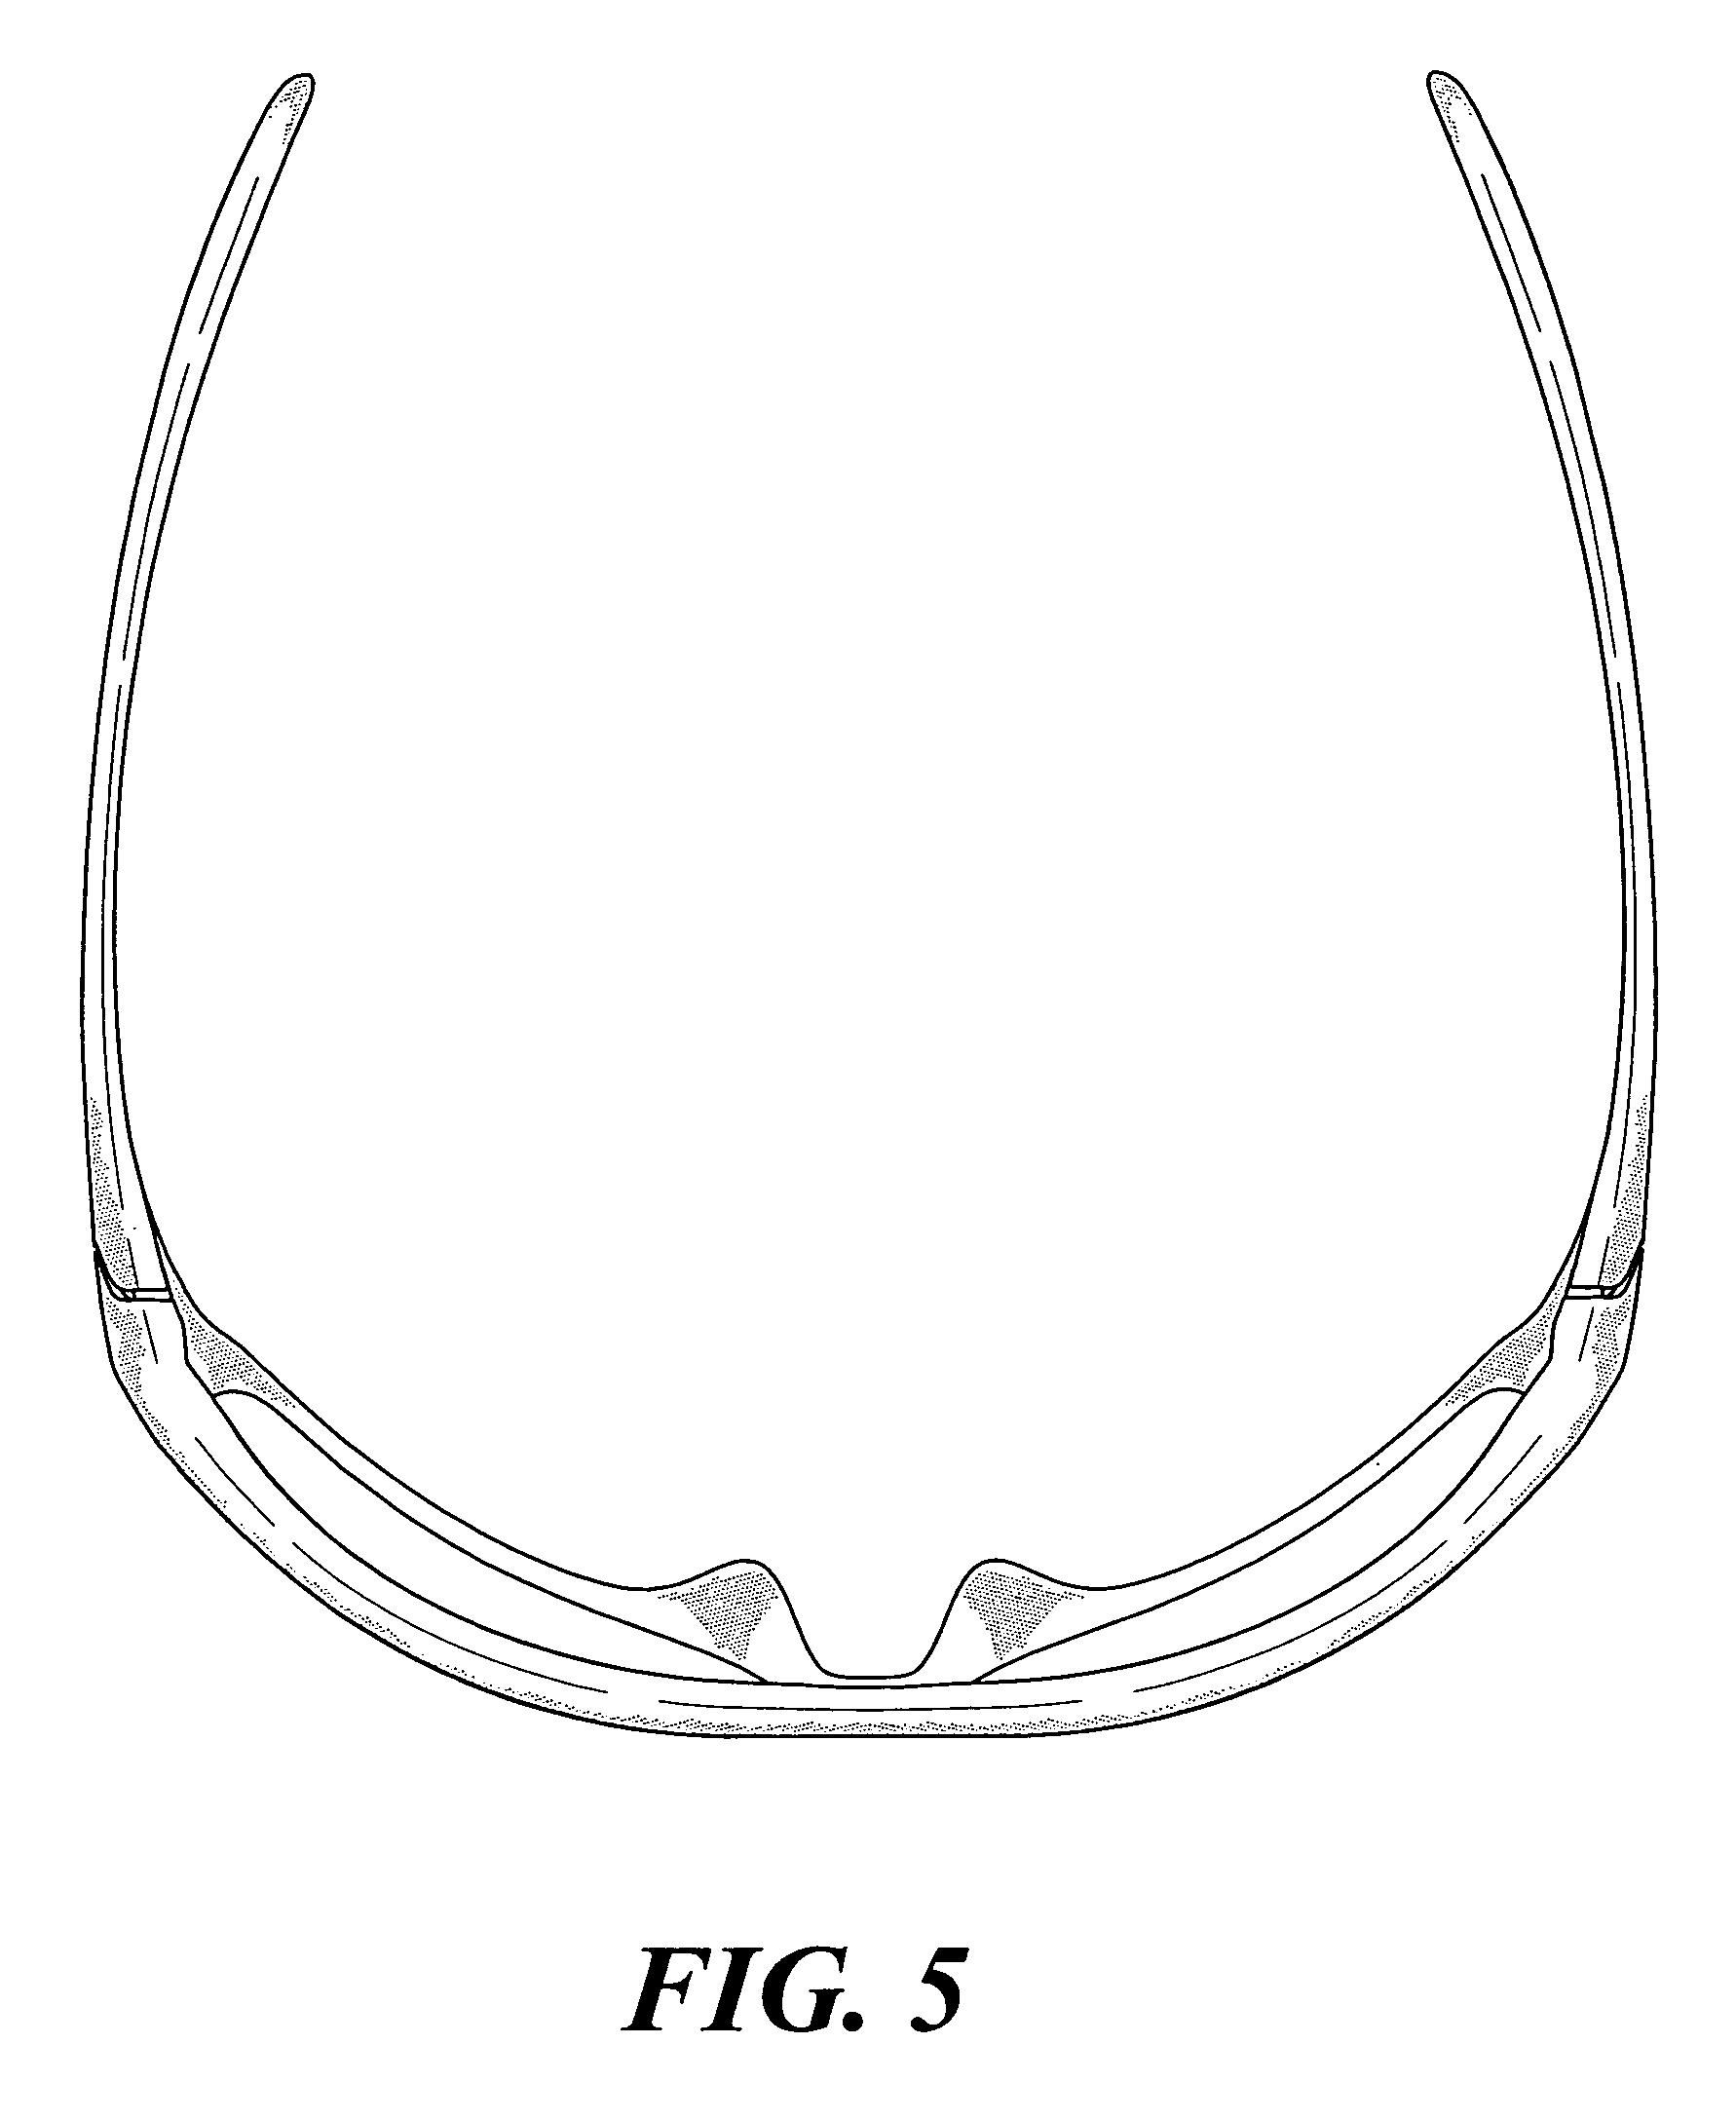 eyeglass frame styles  usd561814 - eyeglass